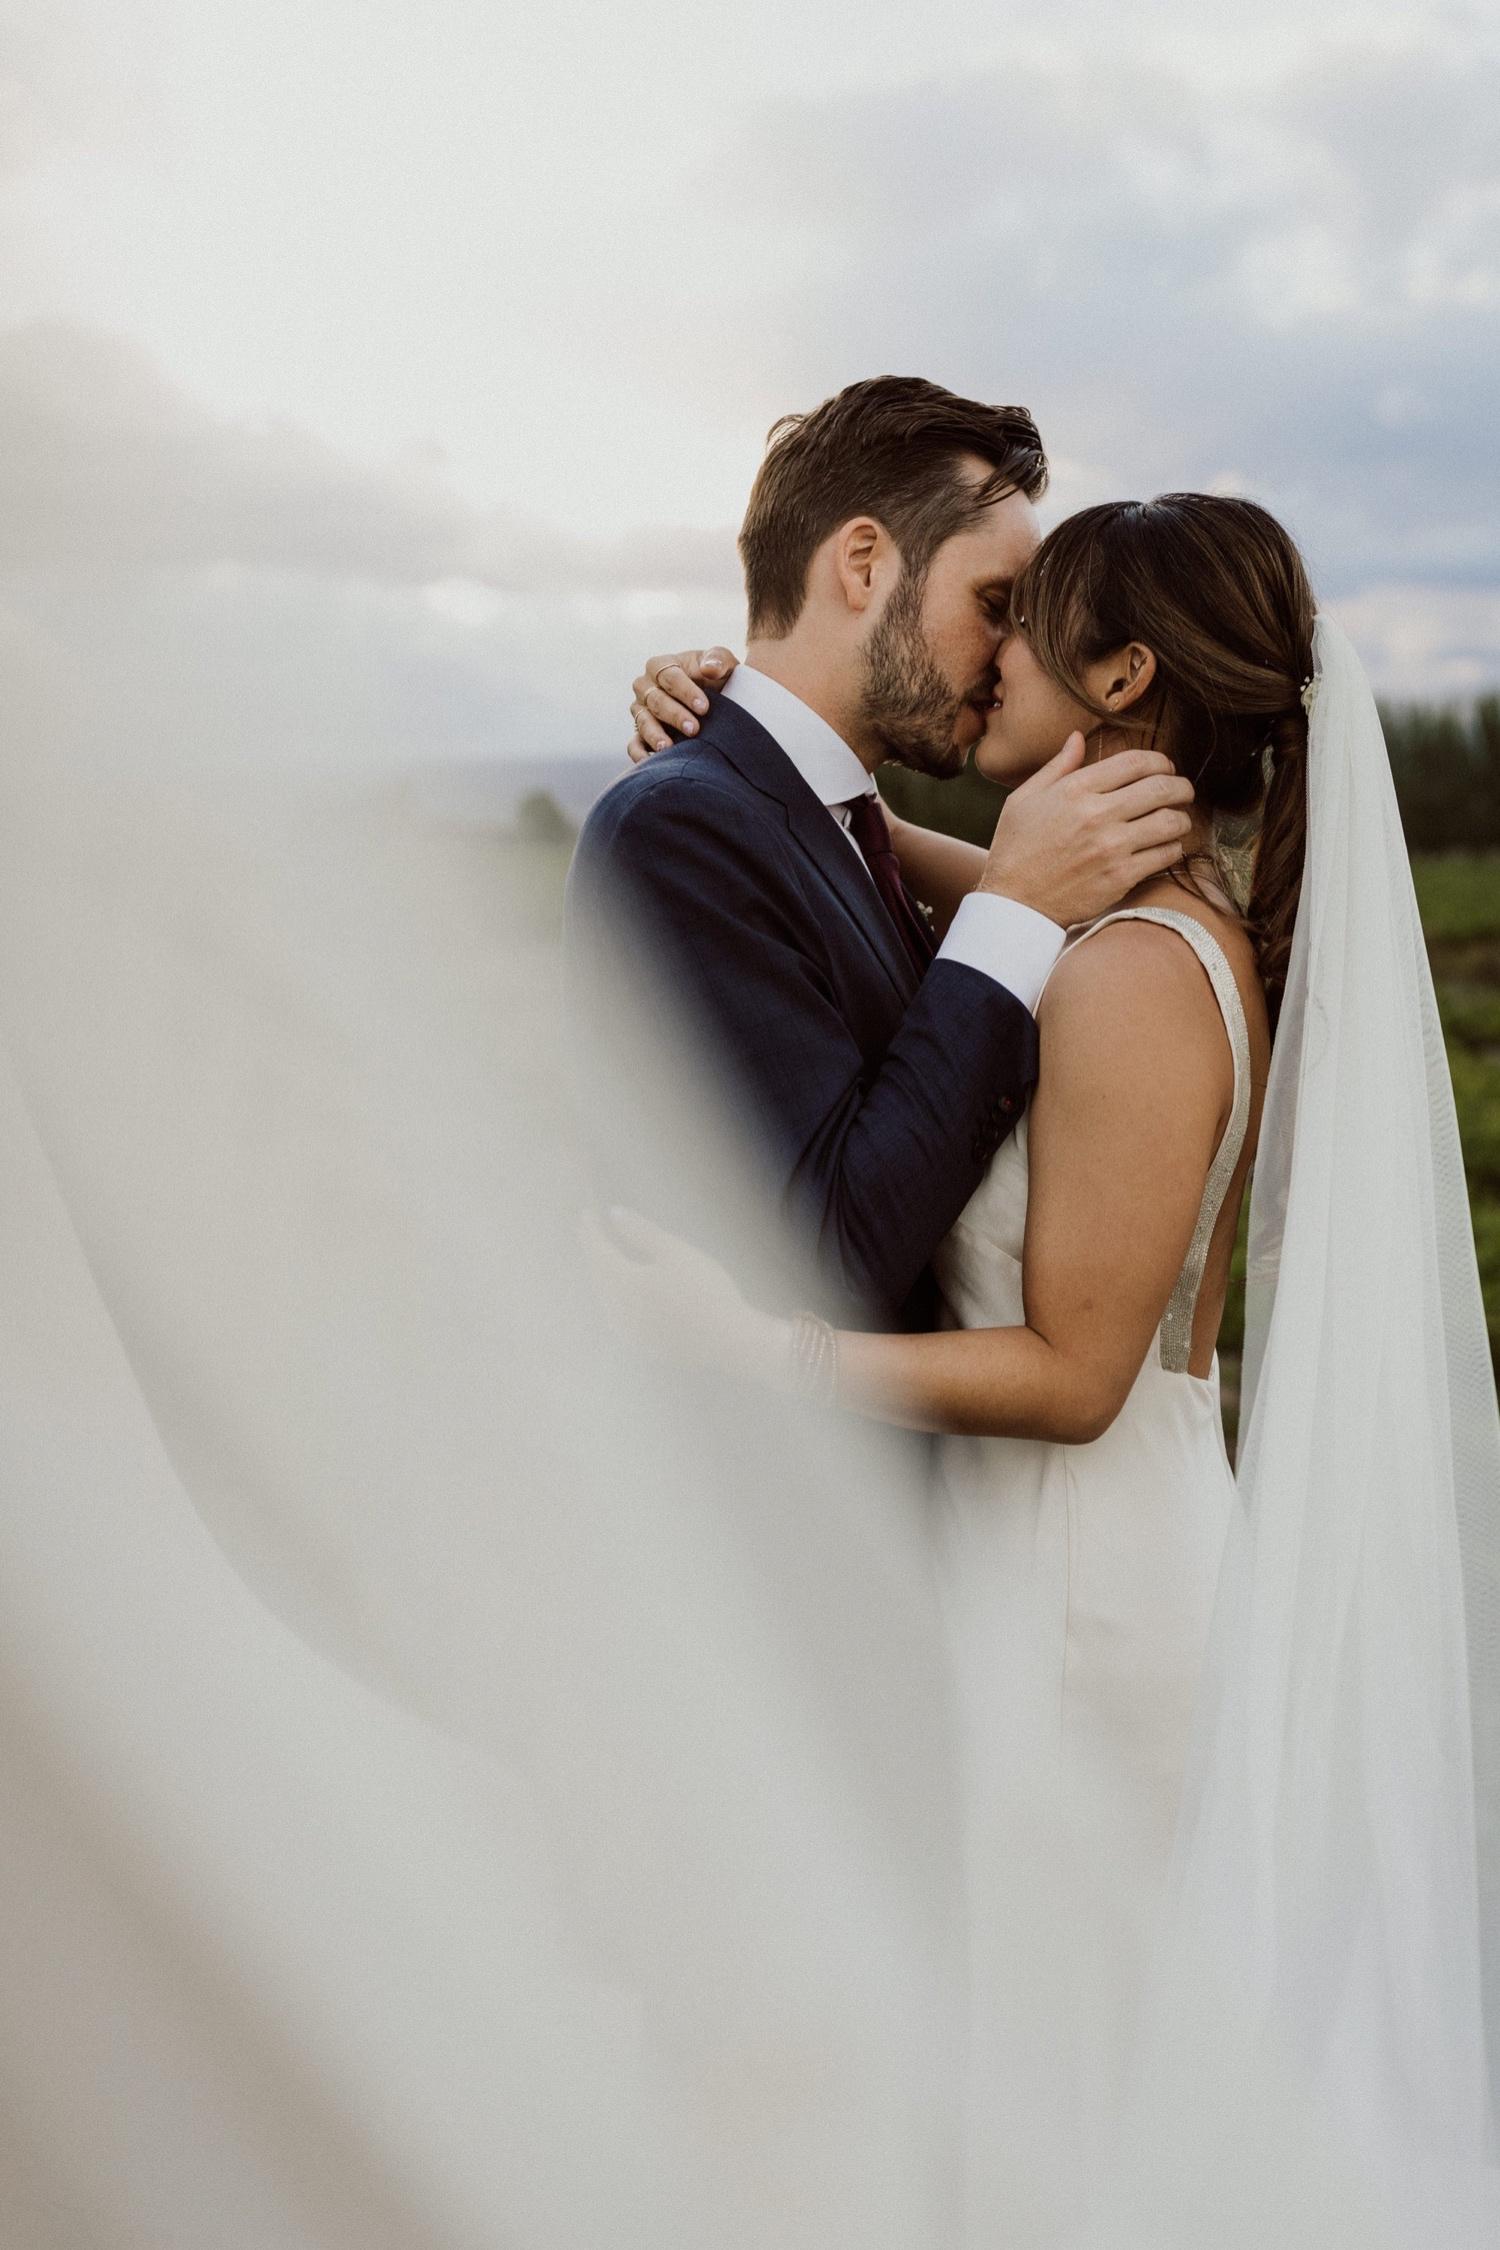 074_wedding_day_portraits.jpg